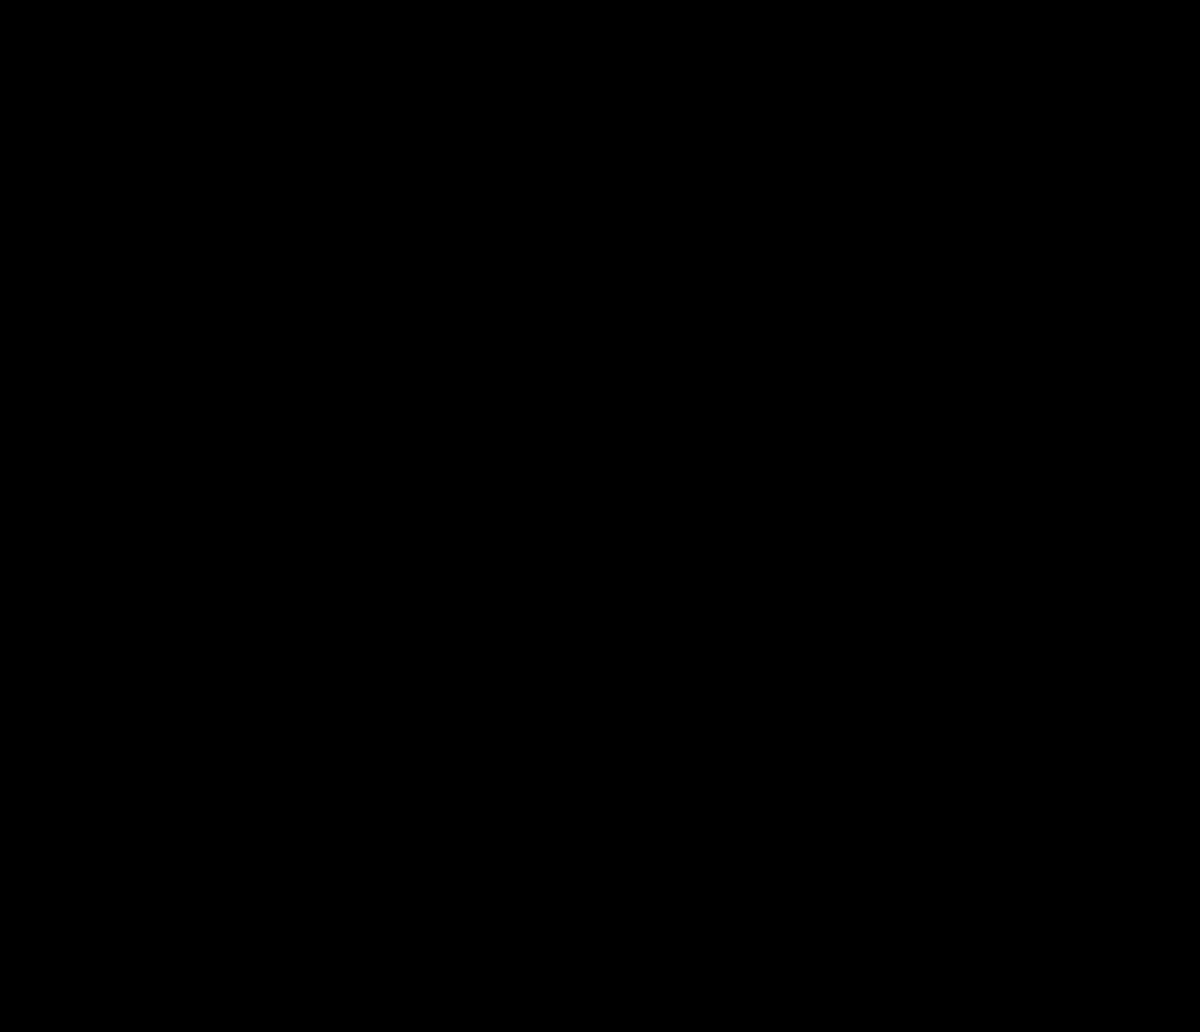 Melonheadz LDS illustrating: November 2011